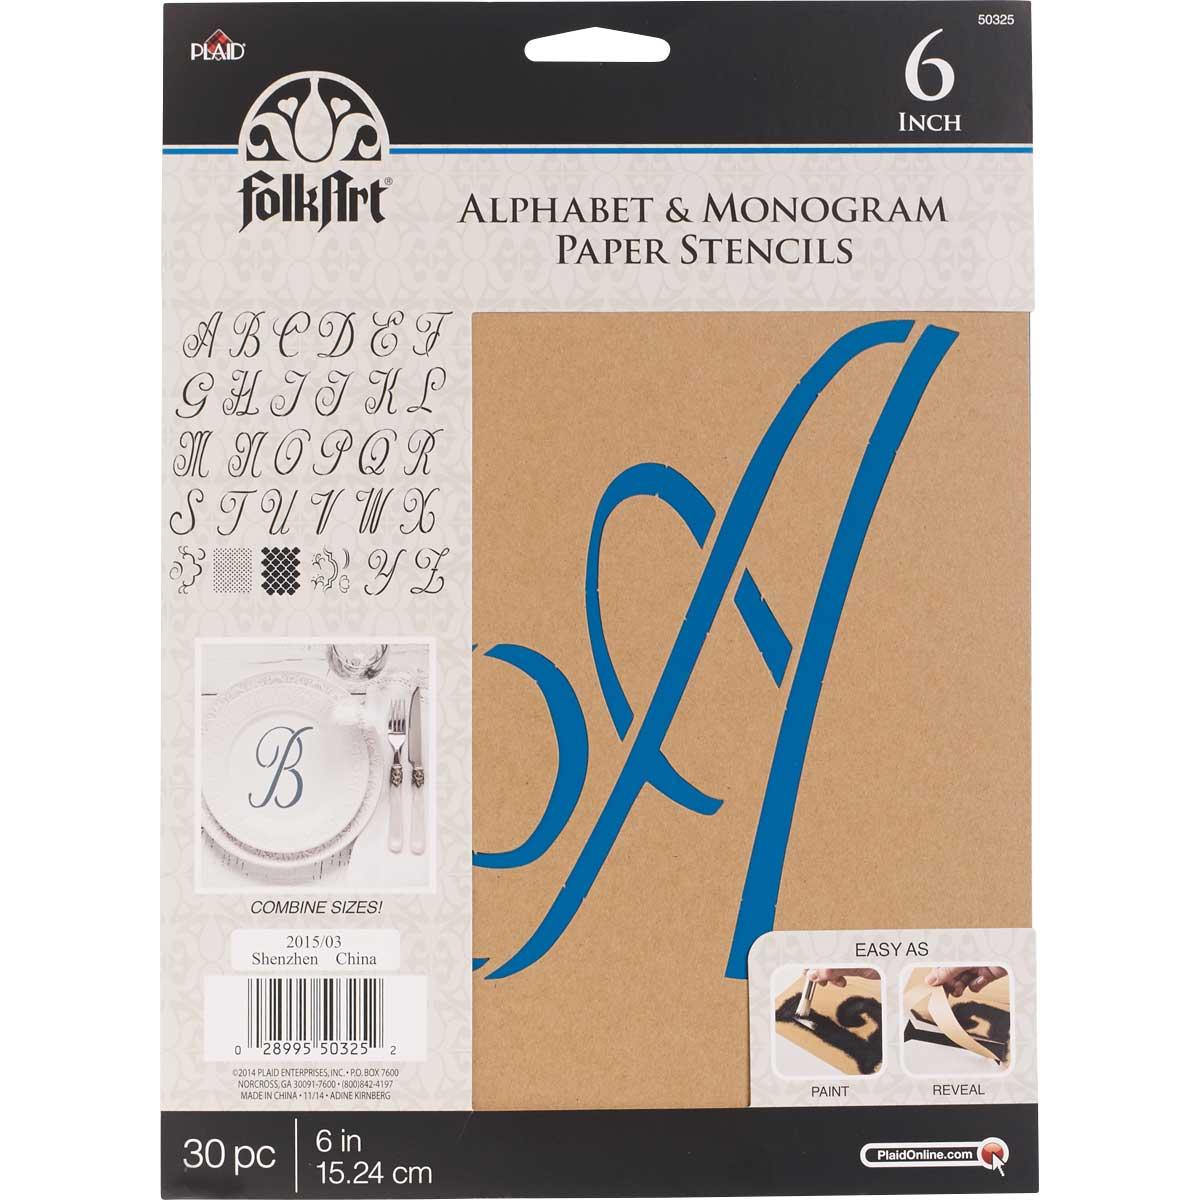 FolkArt ® Alphabet & Monogram Paper Stencils - Script Font, 6